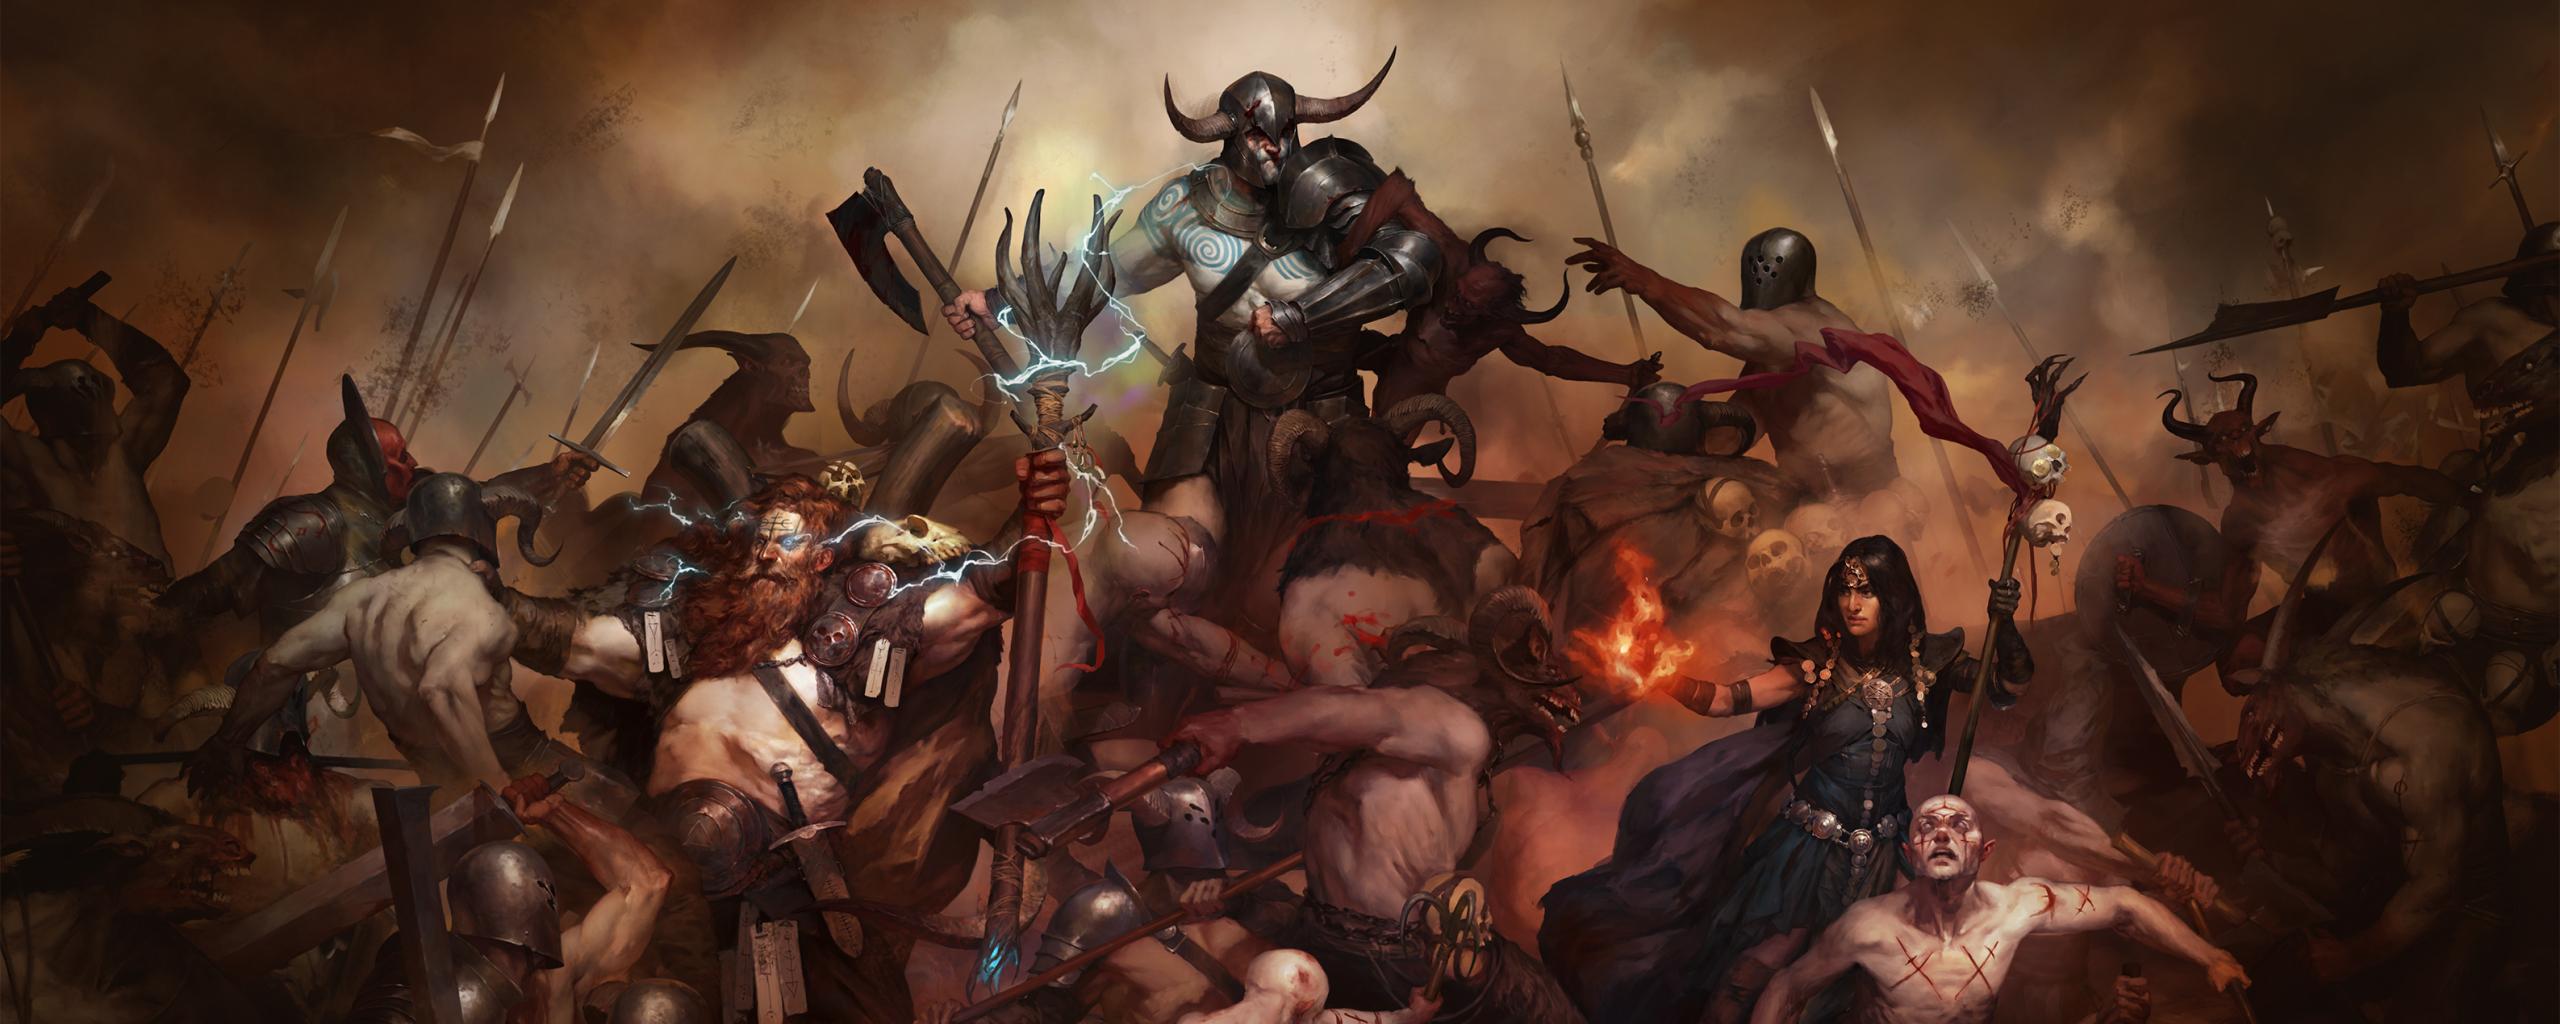 2560x1024 Diablo 4 2560x1024 Resolution Wallpaper, HD ...